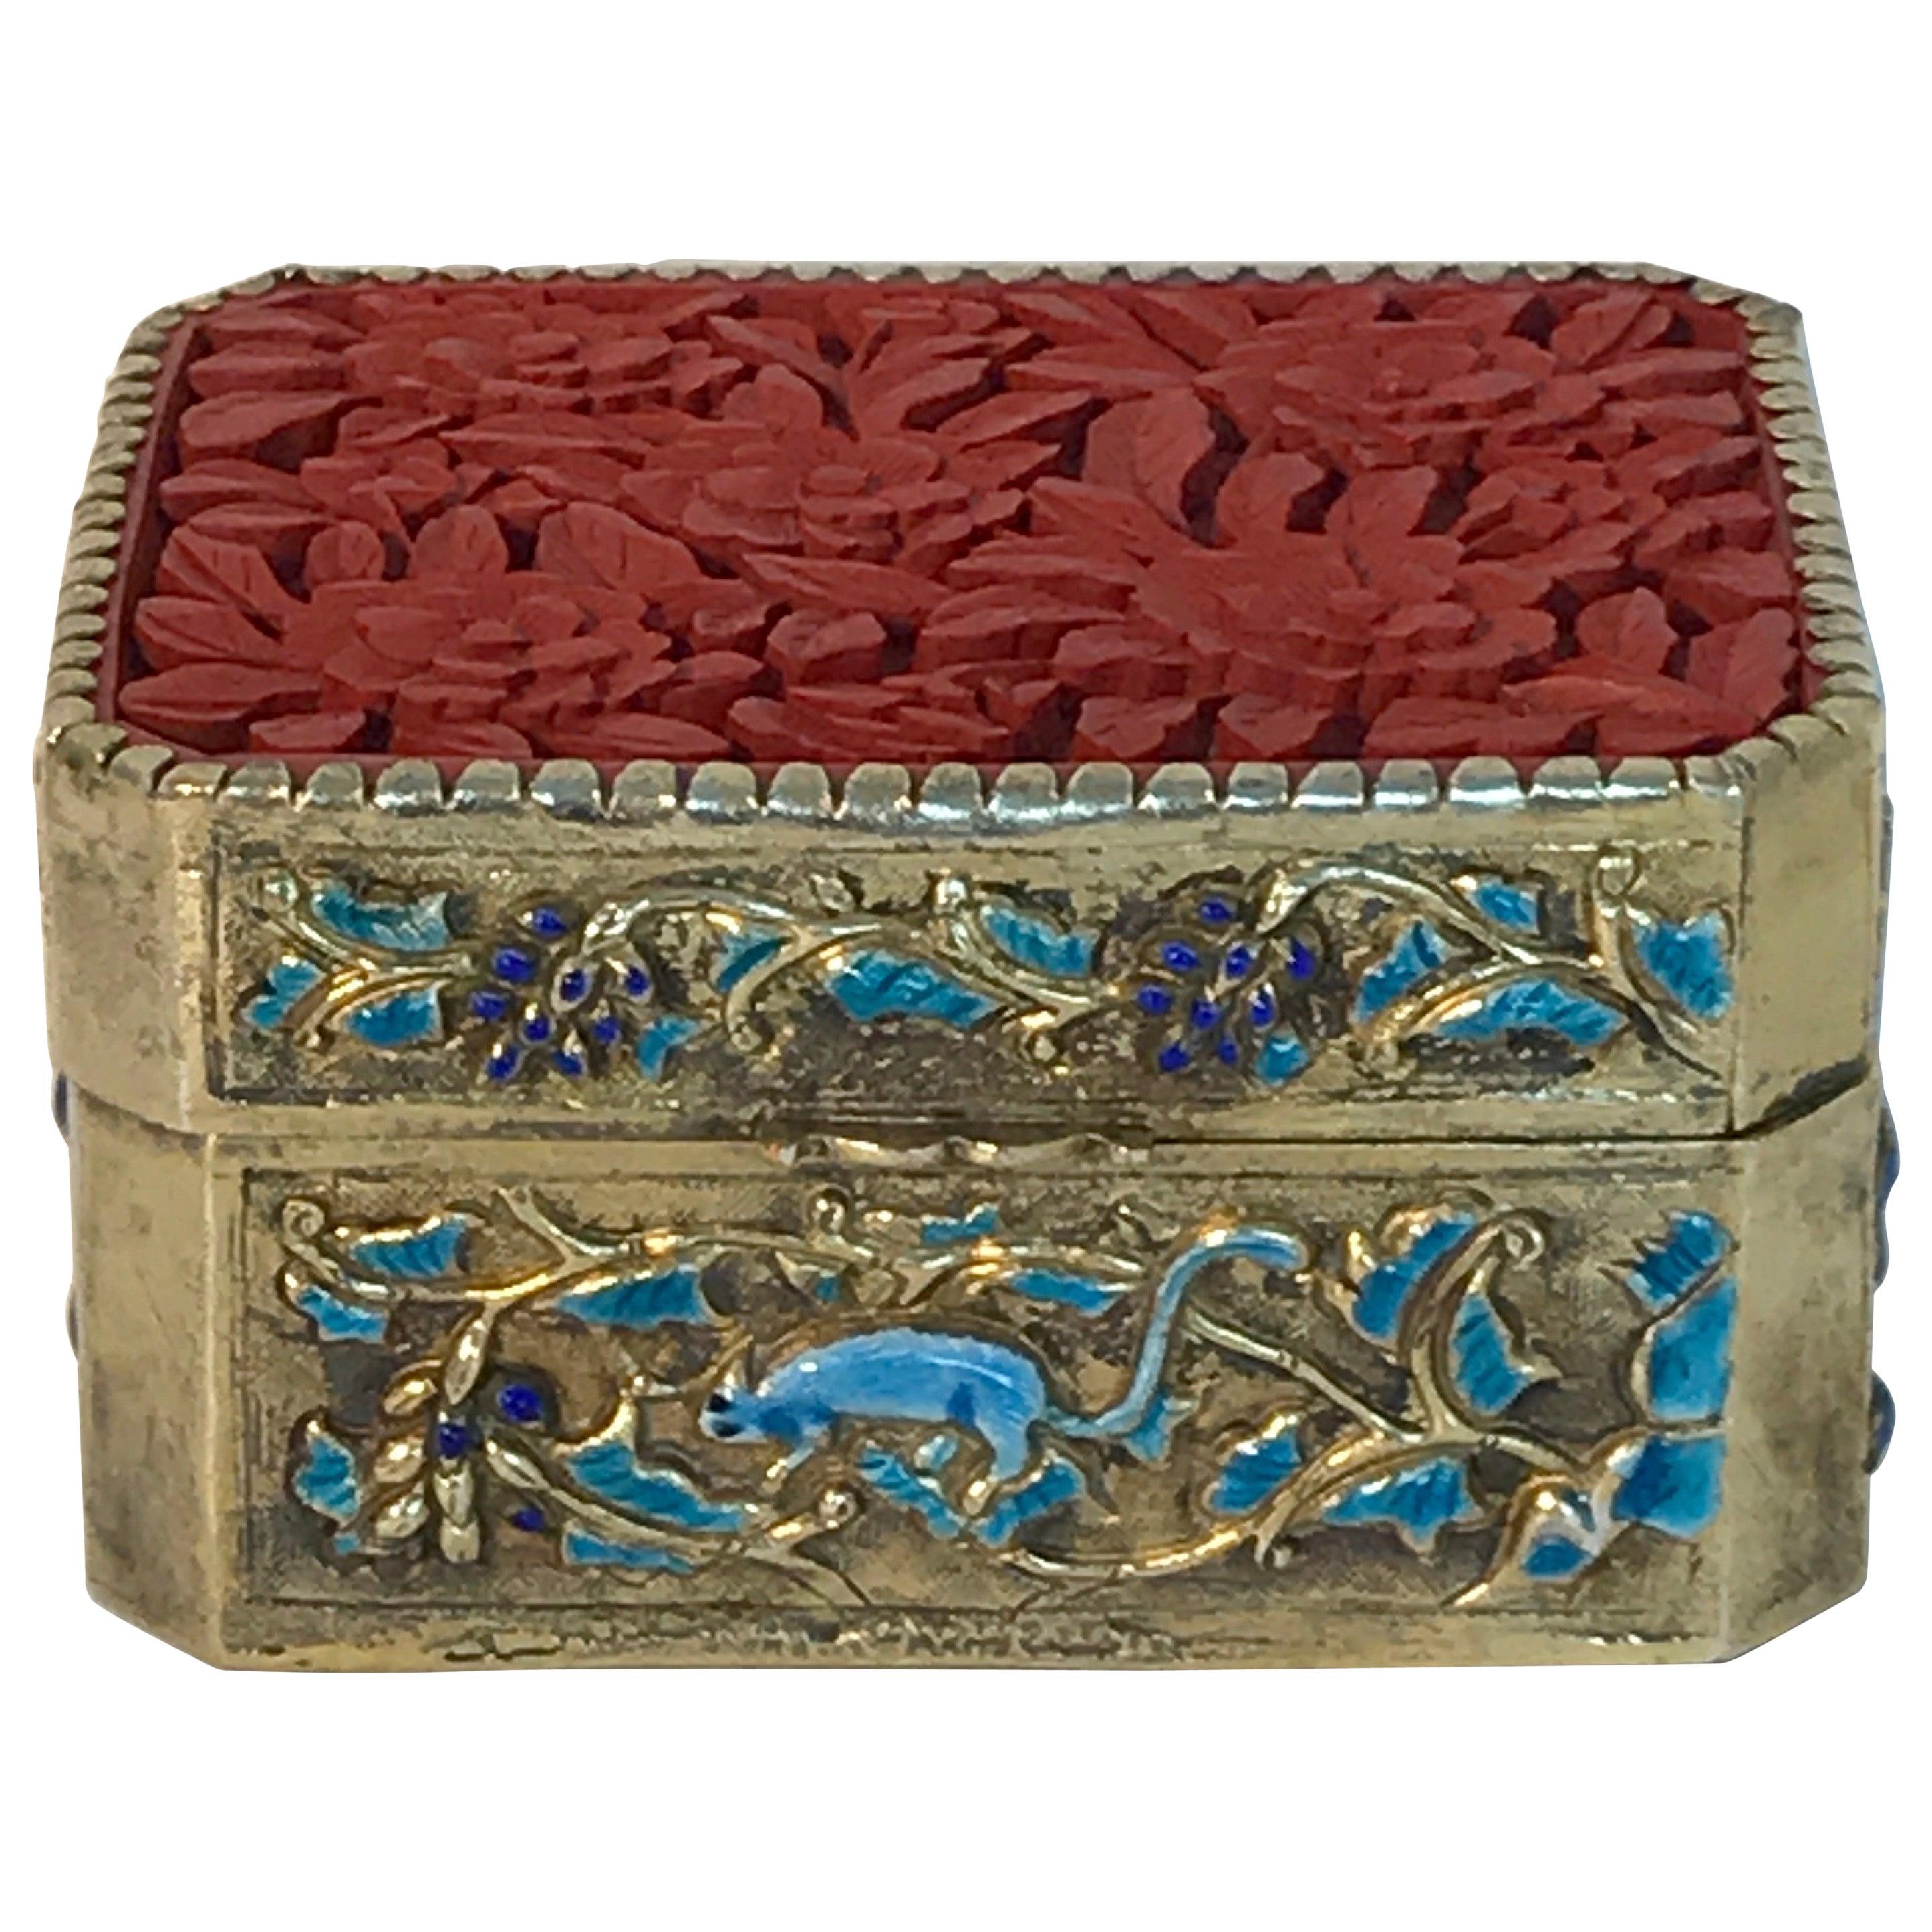 Chinese Export Silver Vermeil Enamel Carved Cinnabar Box